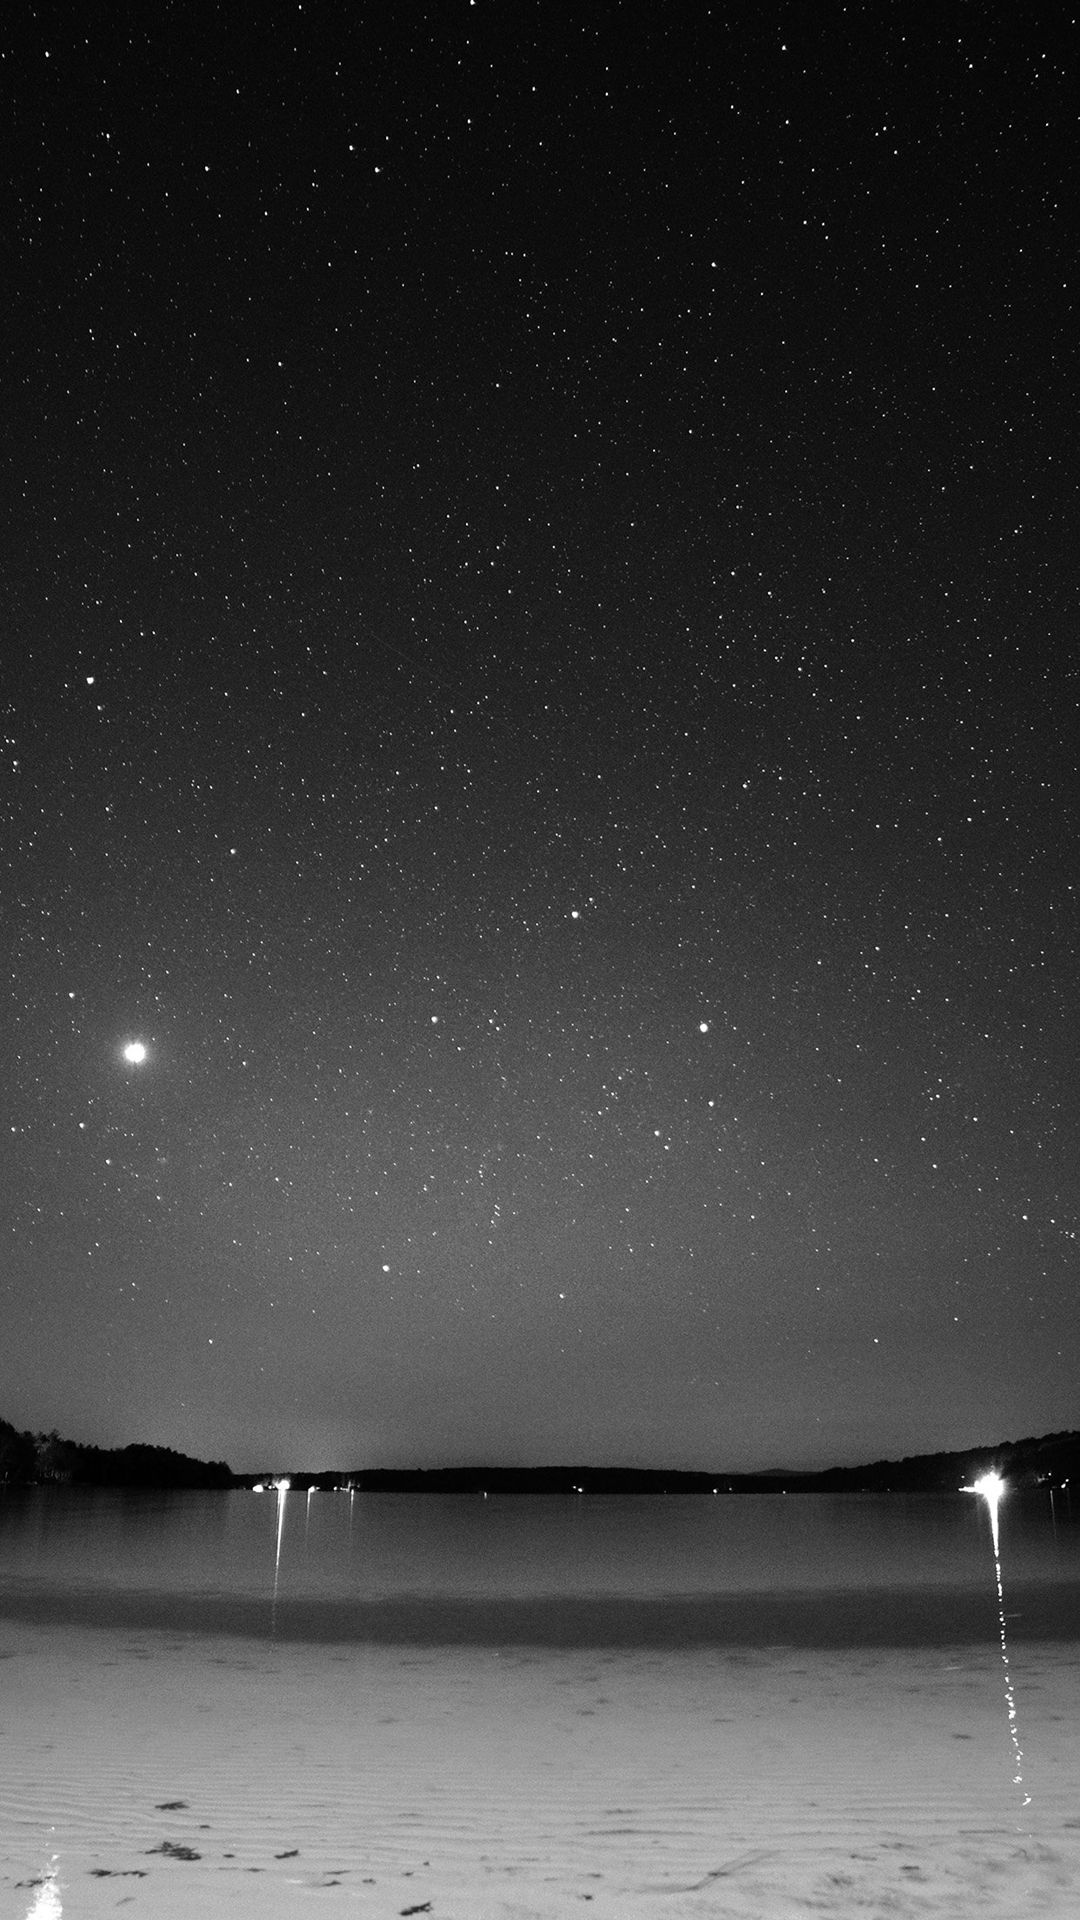 Night Beach Sea Vacation Nature Star Sky Dark Bw Iphone 8 Wallpapers Iphone 5s Wallpaper Star Sky Wallpaper